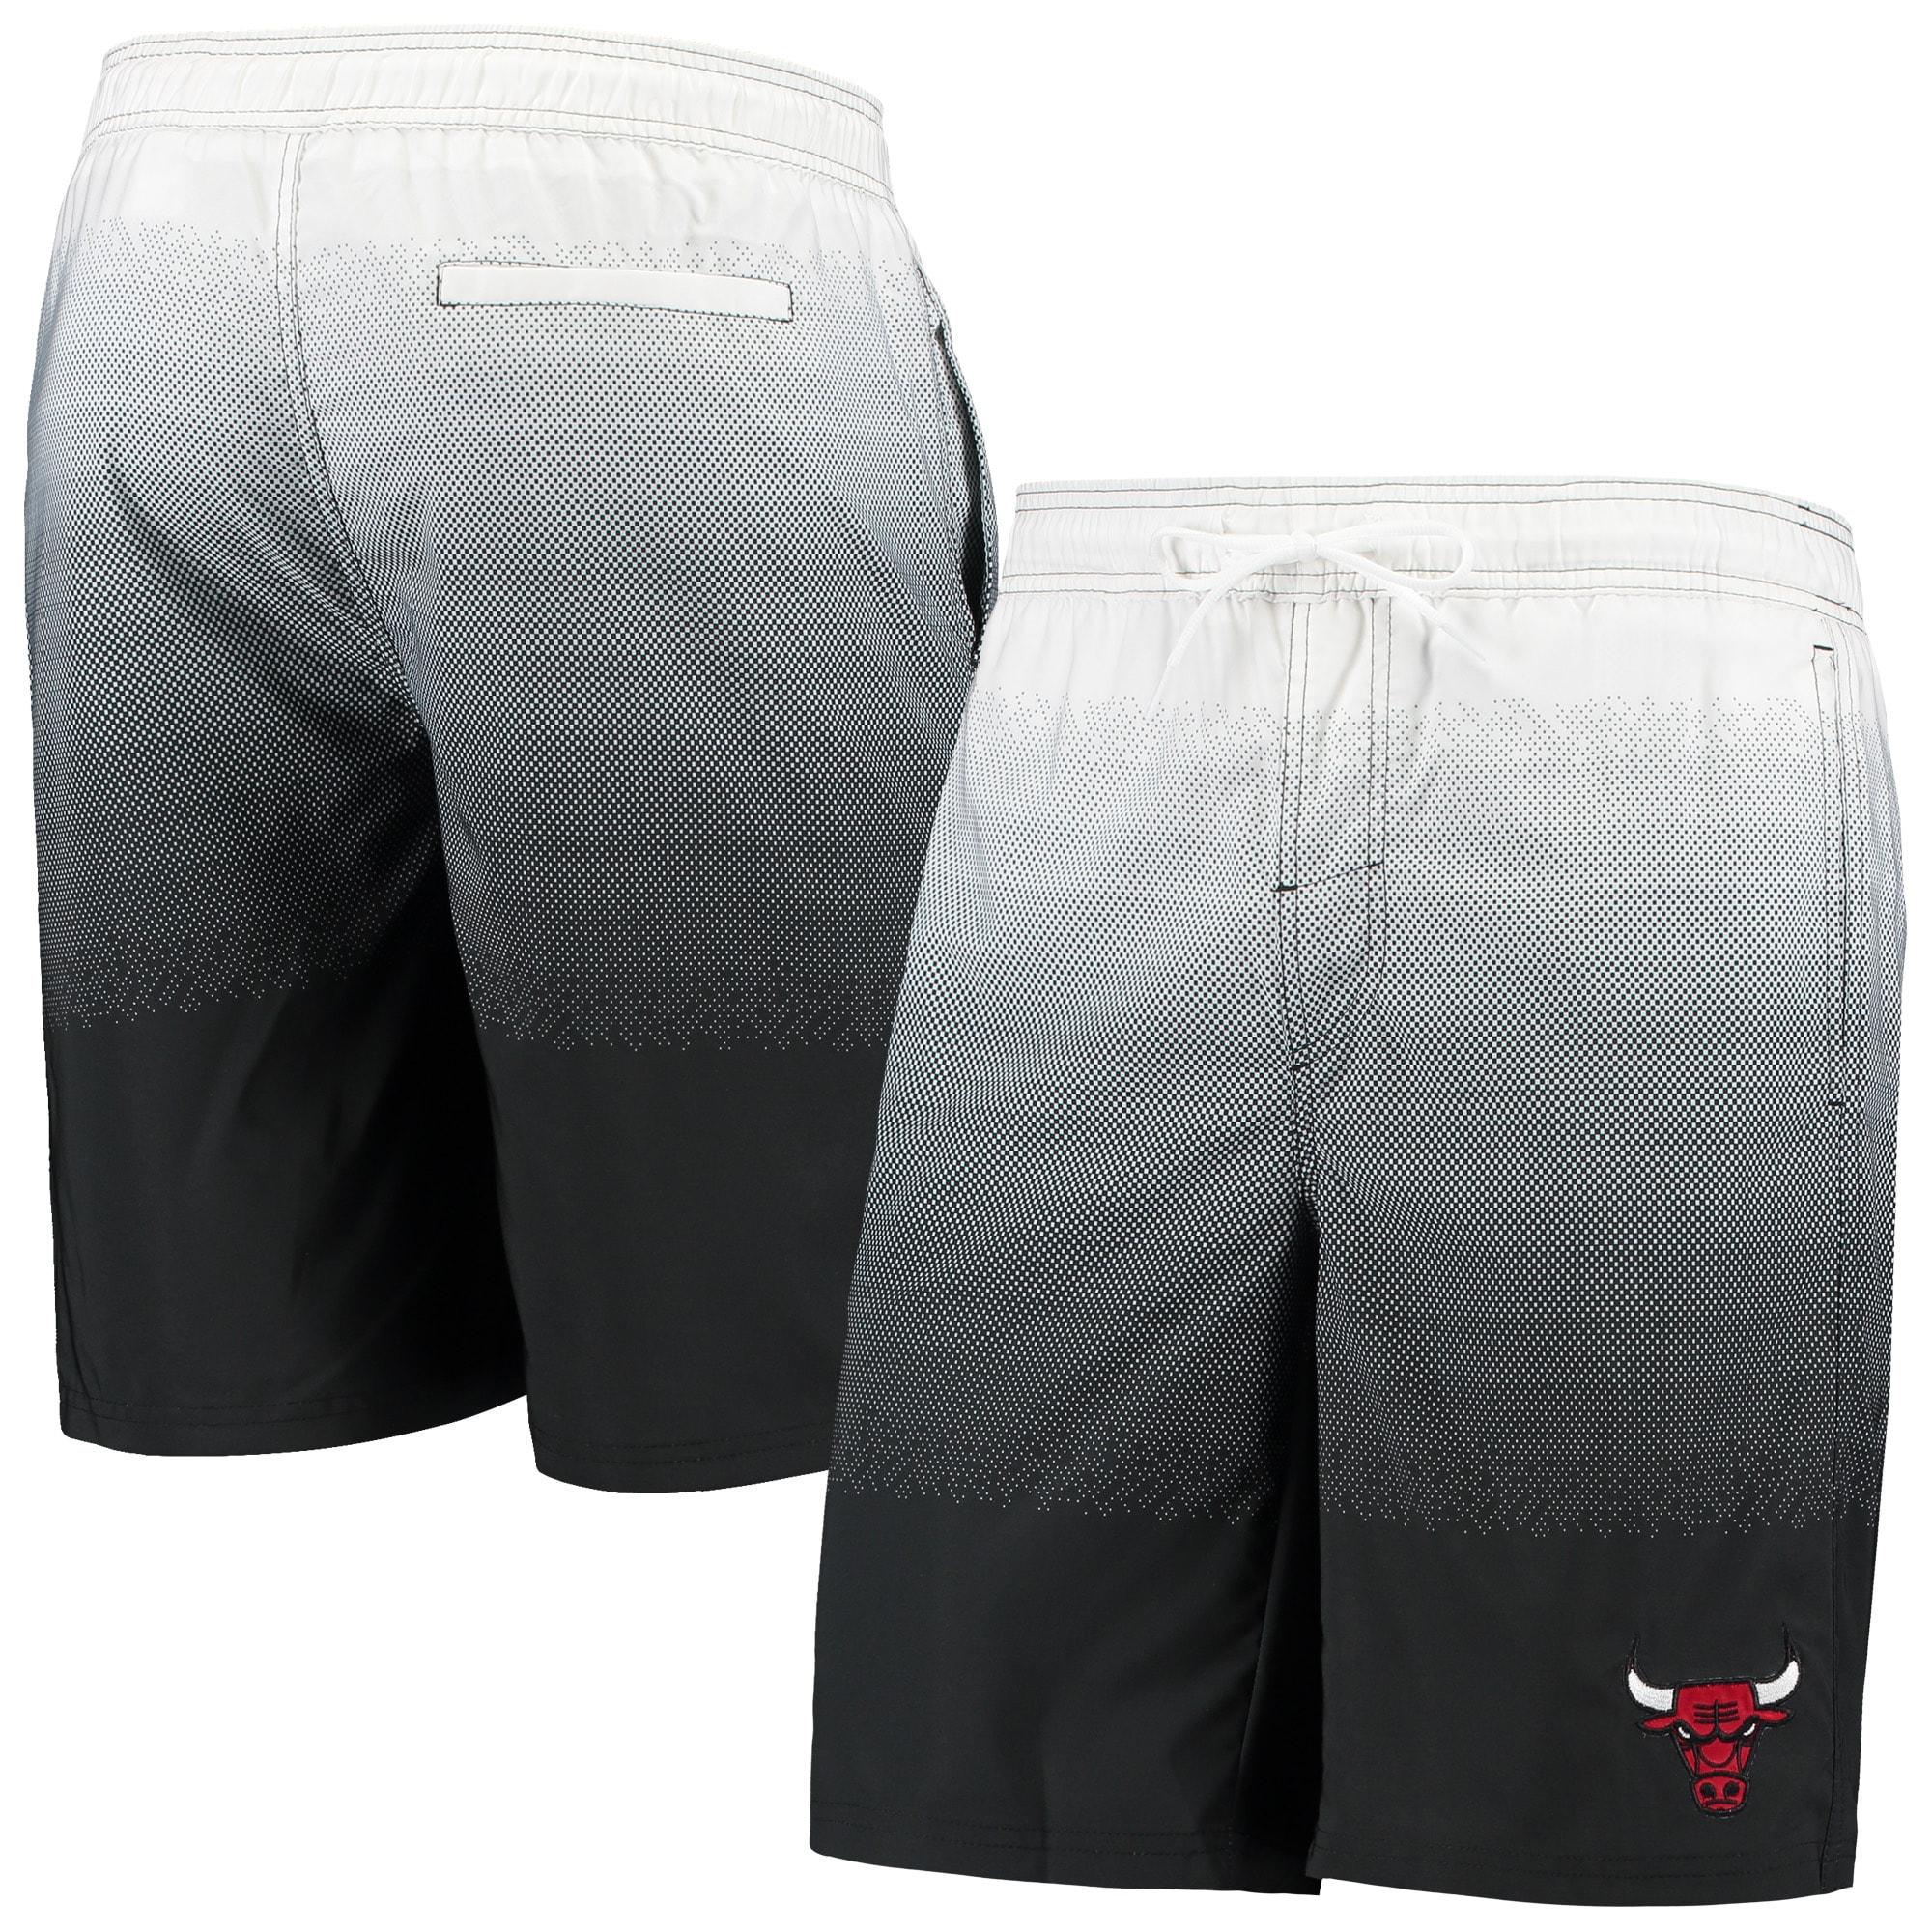 Chicago Bulls G-III Sports by Carl Banks Horizon Swim Trunks - Black